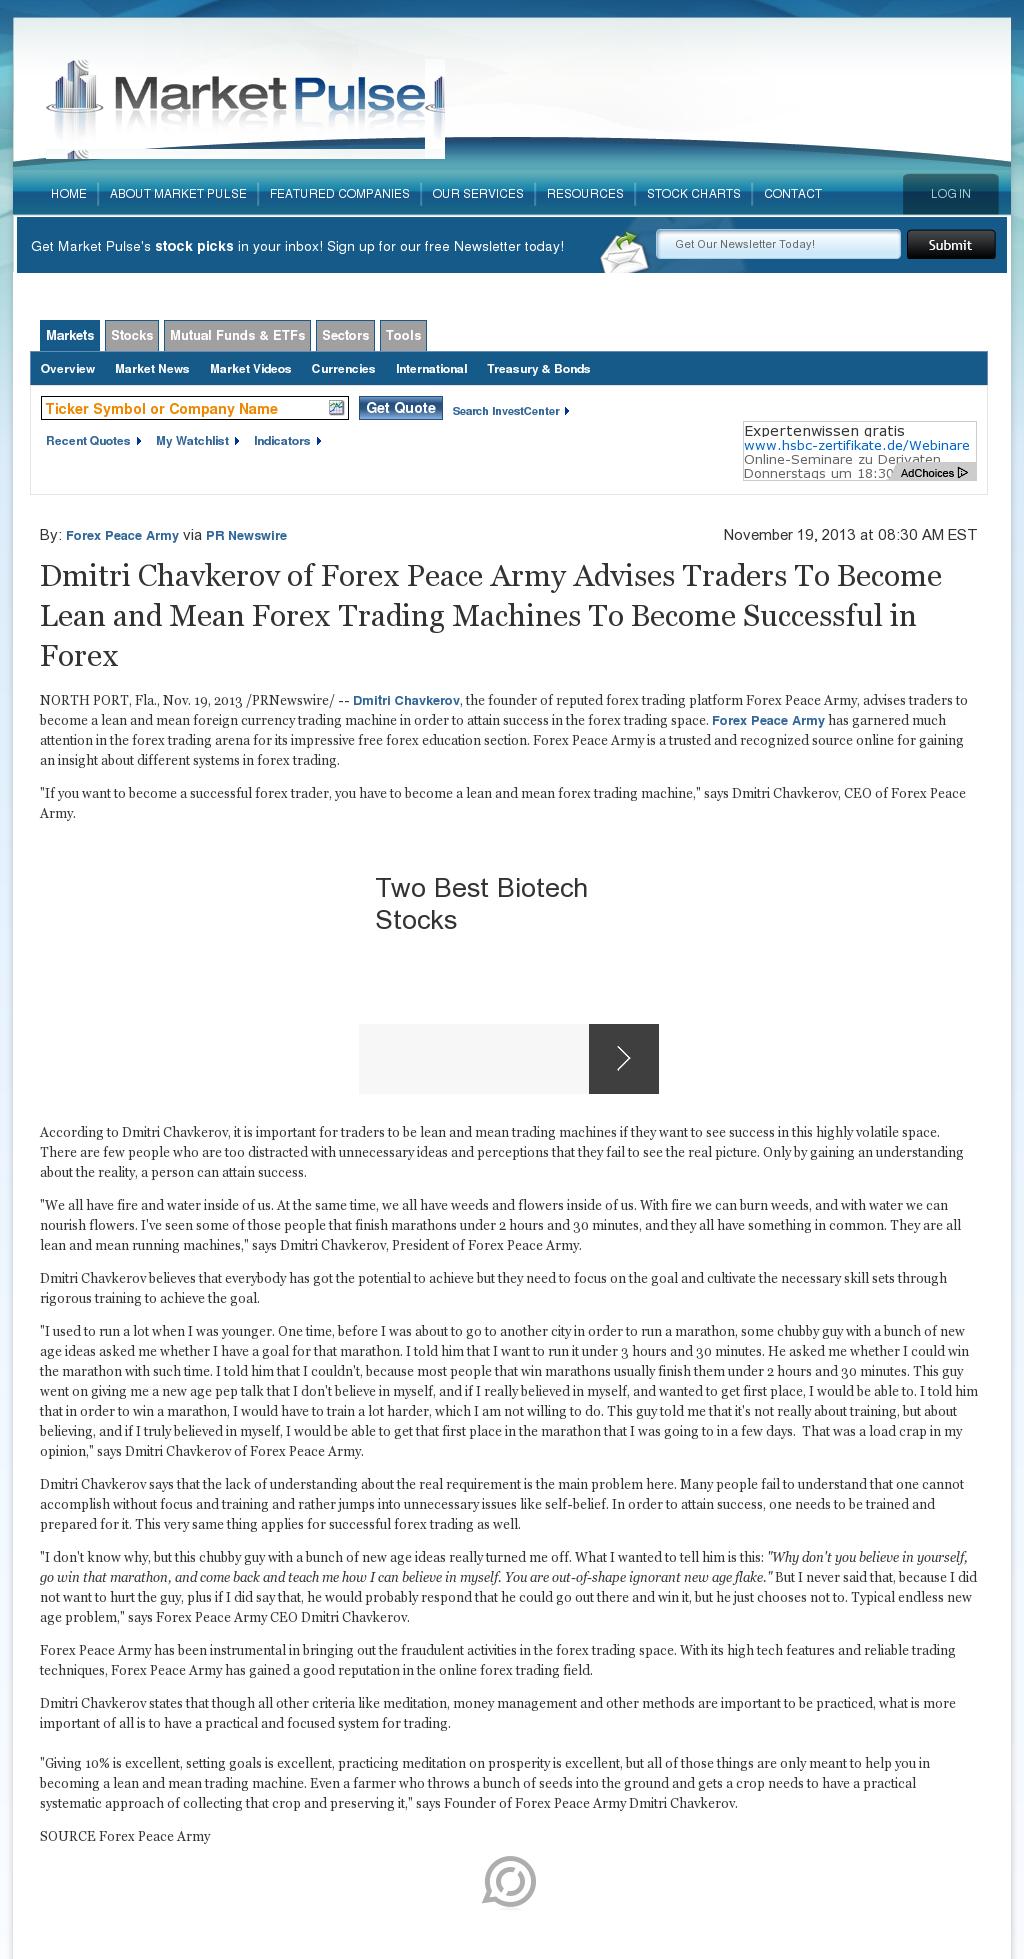 Dmitri Chavkerov - Market Pulse - Lean Forex Trading